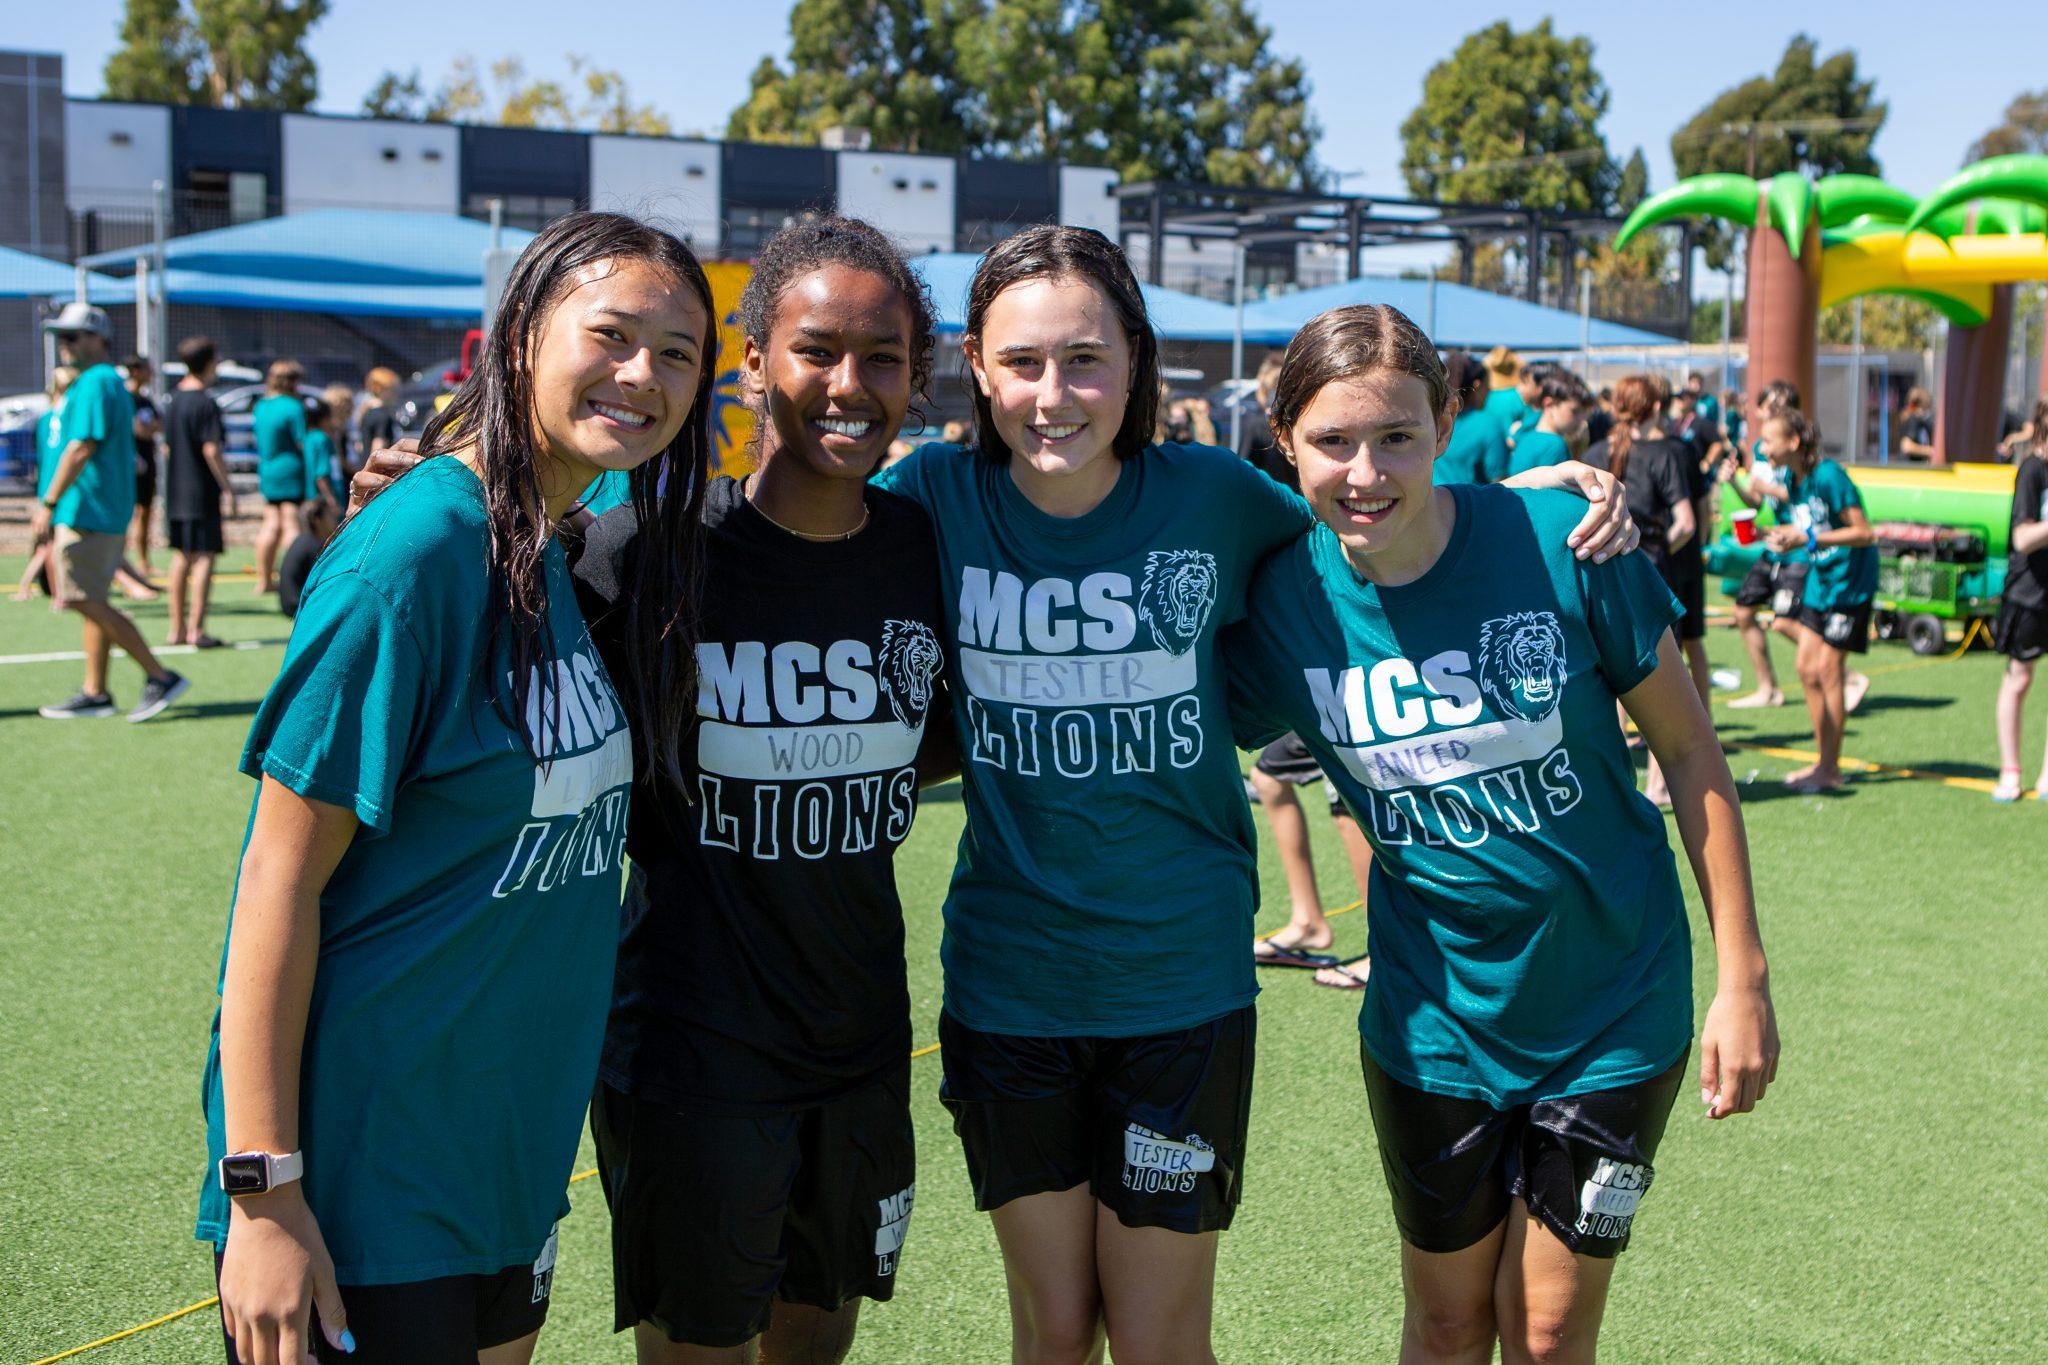 MCS middle school students